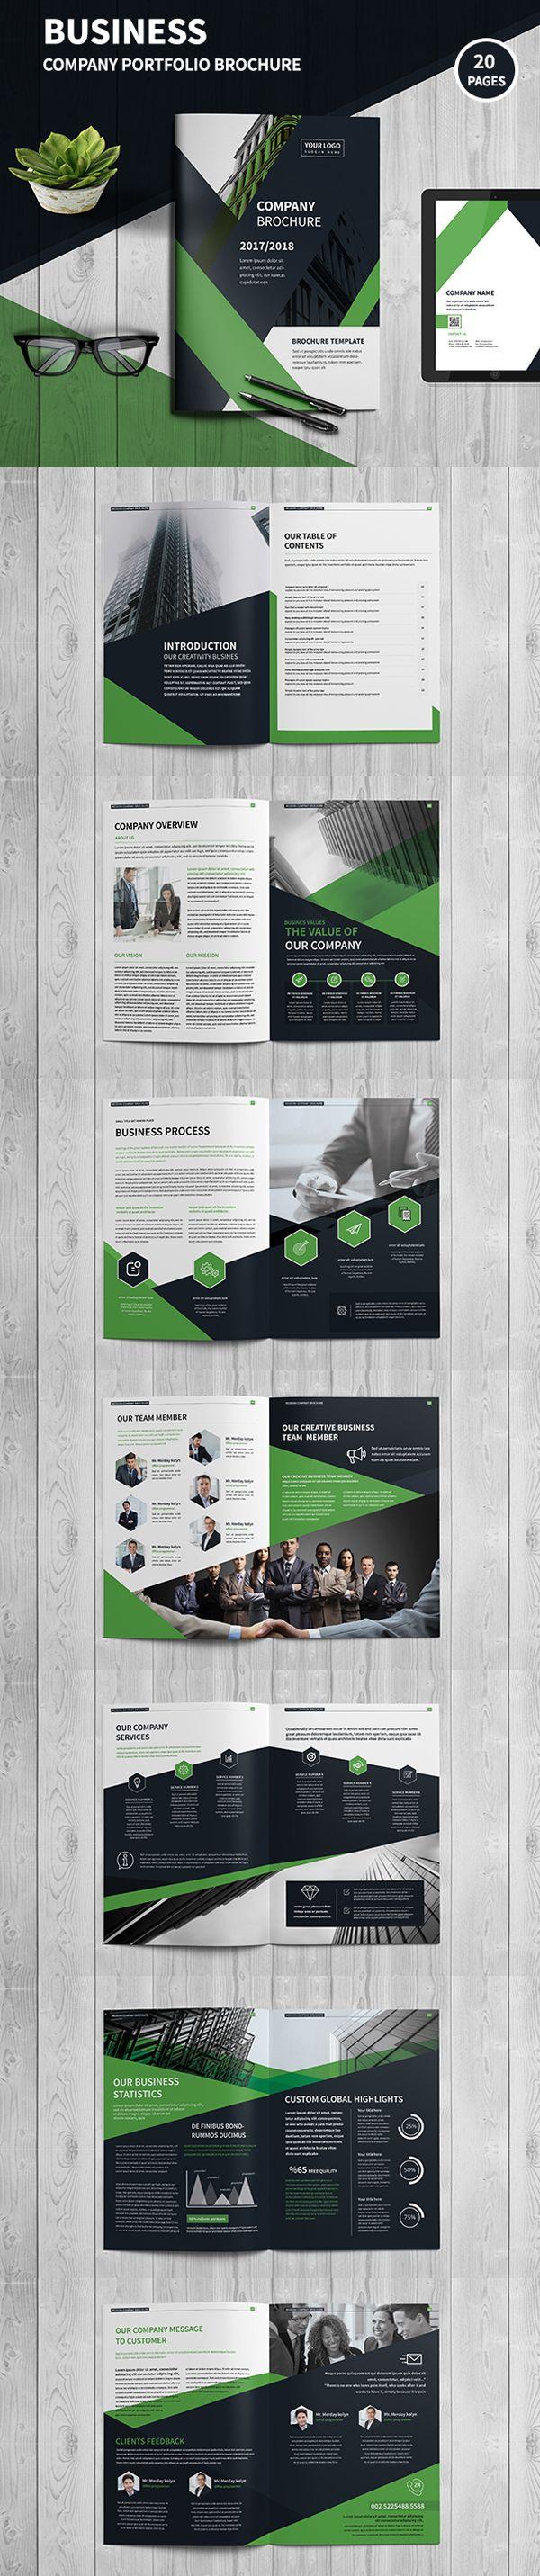 Corporate Company Profile Brochure #annualreport #booklet #brochuredesign #brochuretemplates #fashioncatalog #portfolio